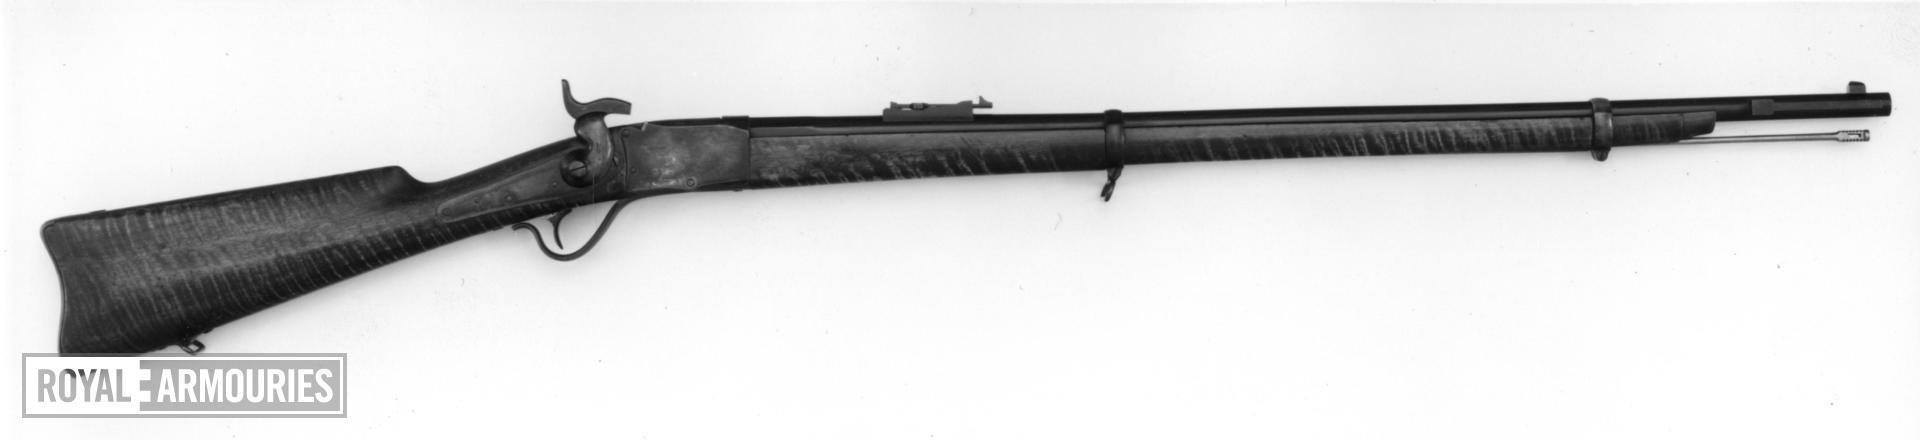 Centrefire breech-loading rifle - Peabody rifle